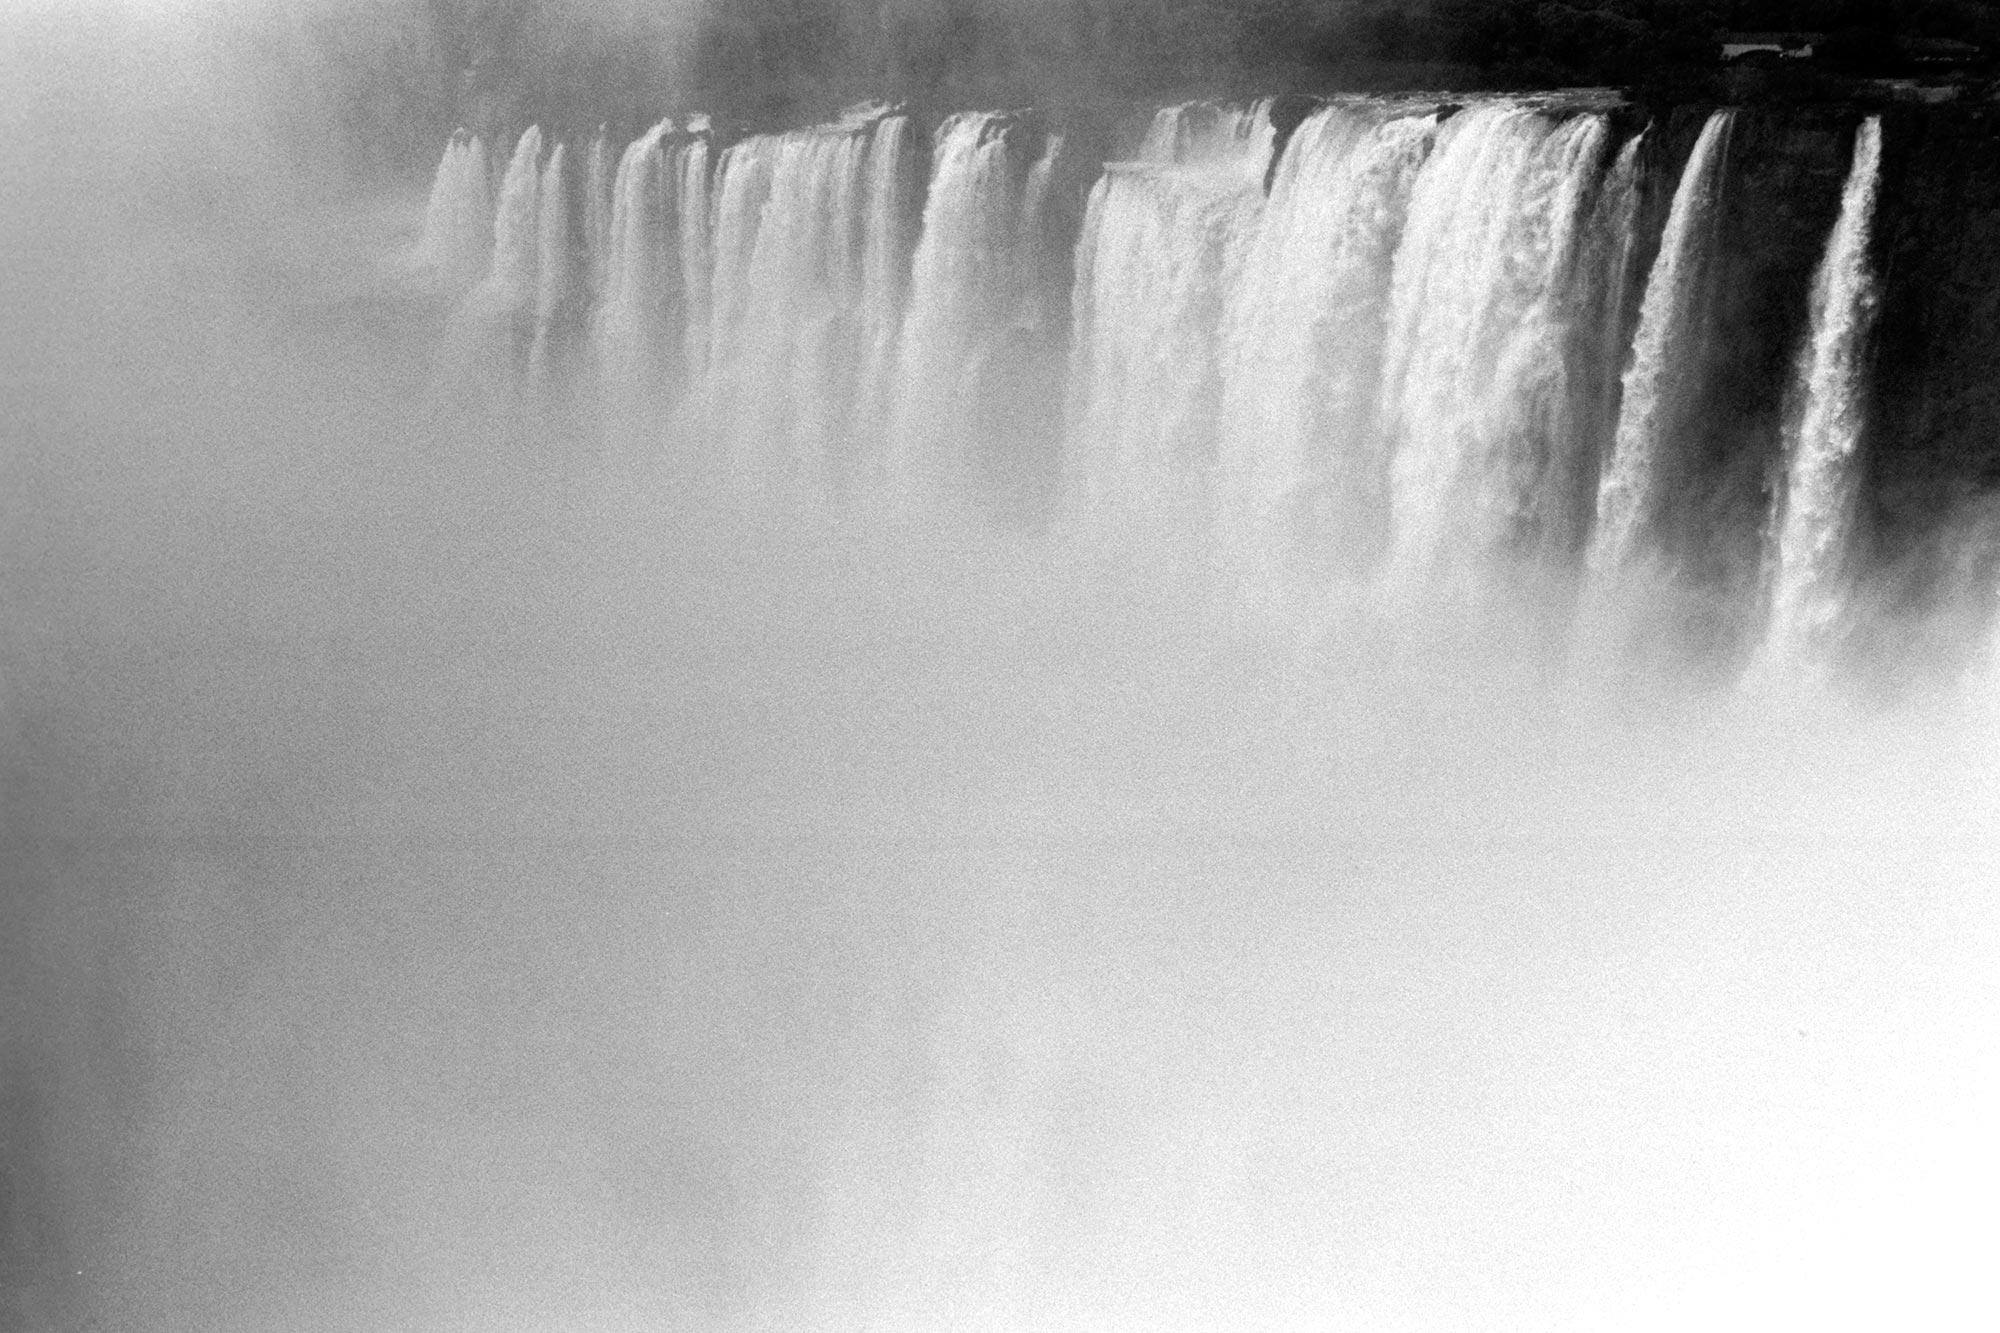 iguazu falls bw vapor garganta del diablo